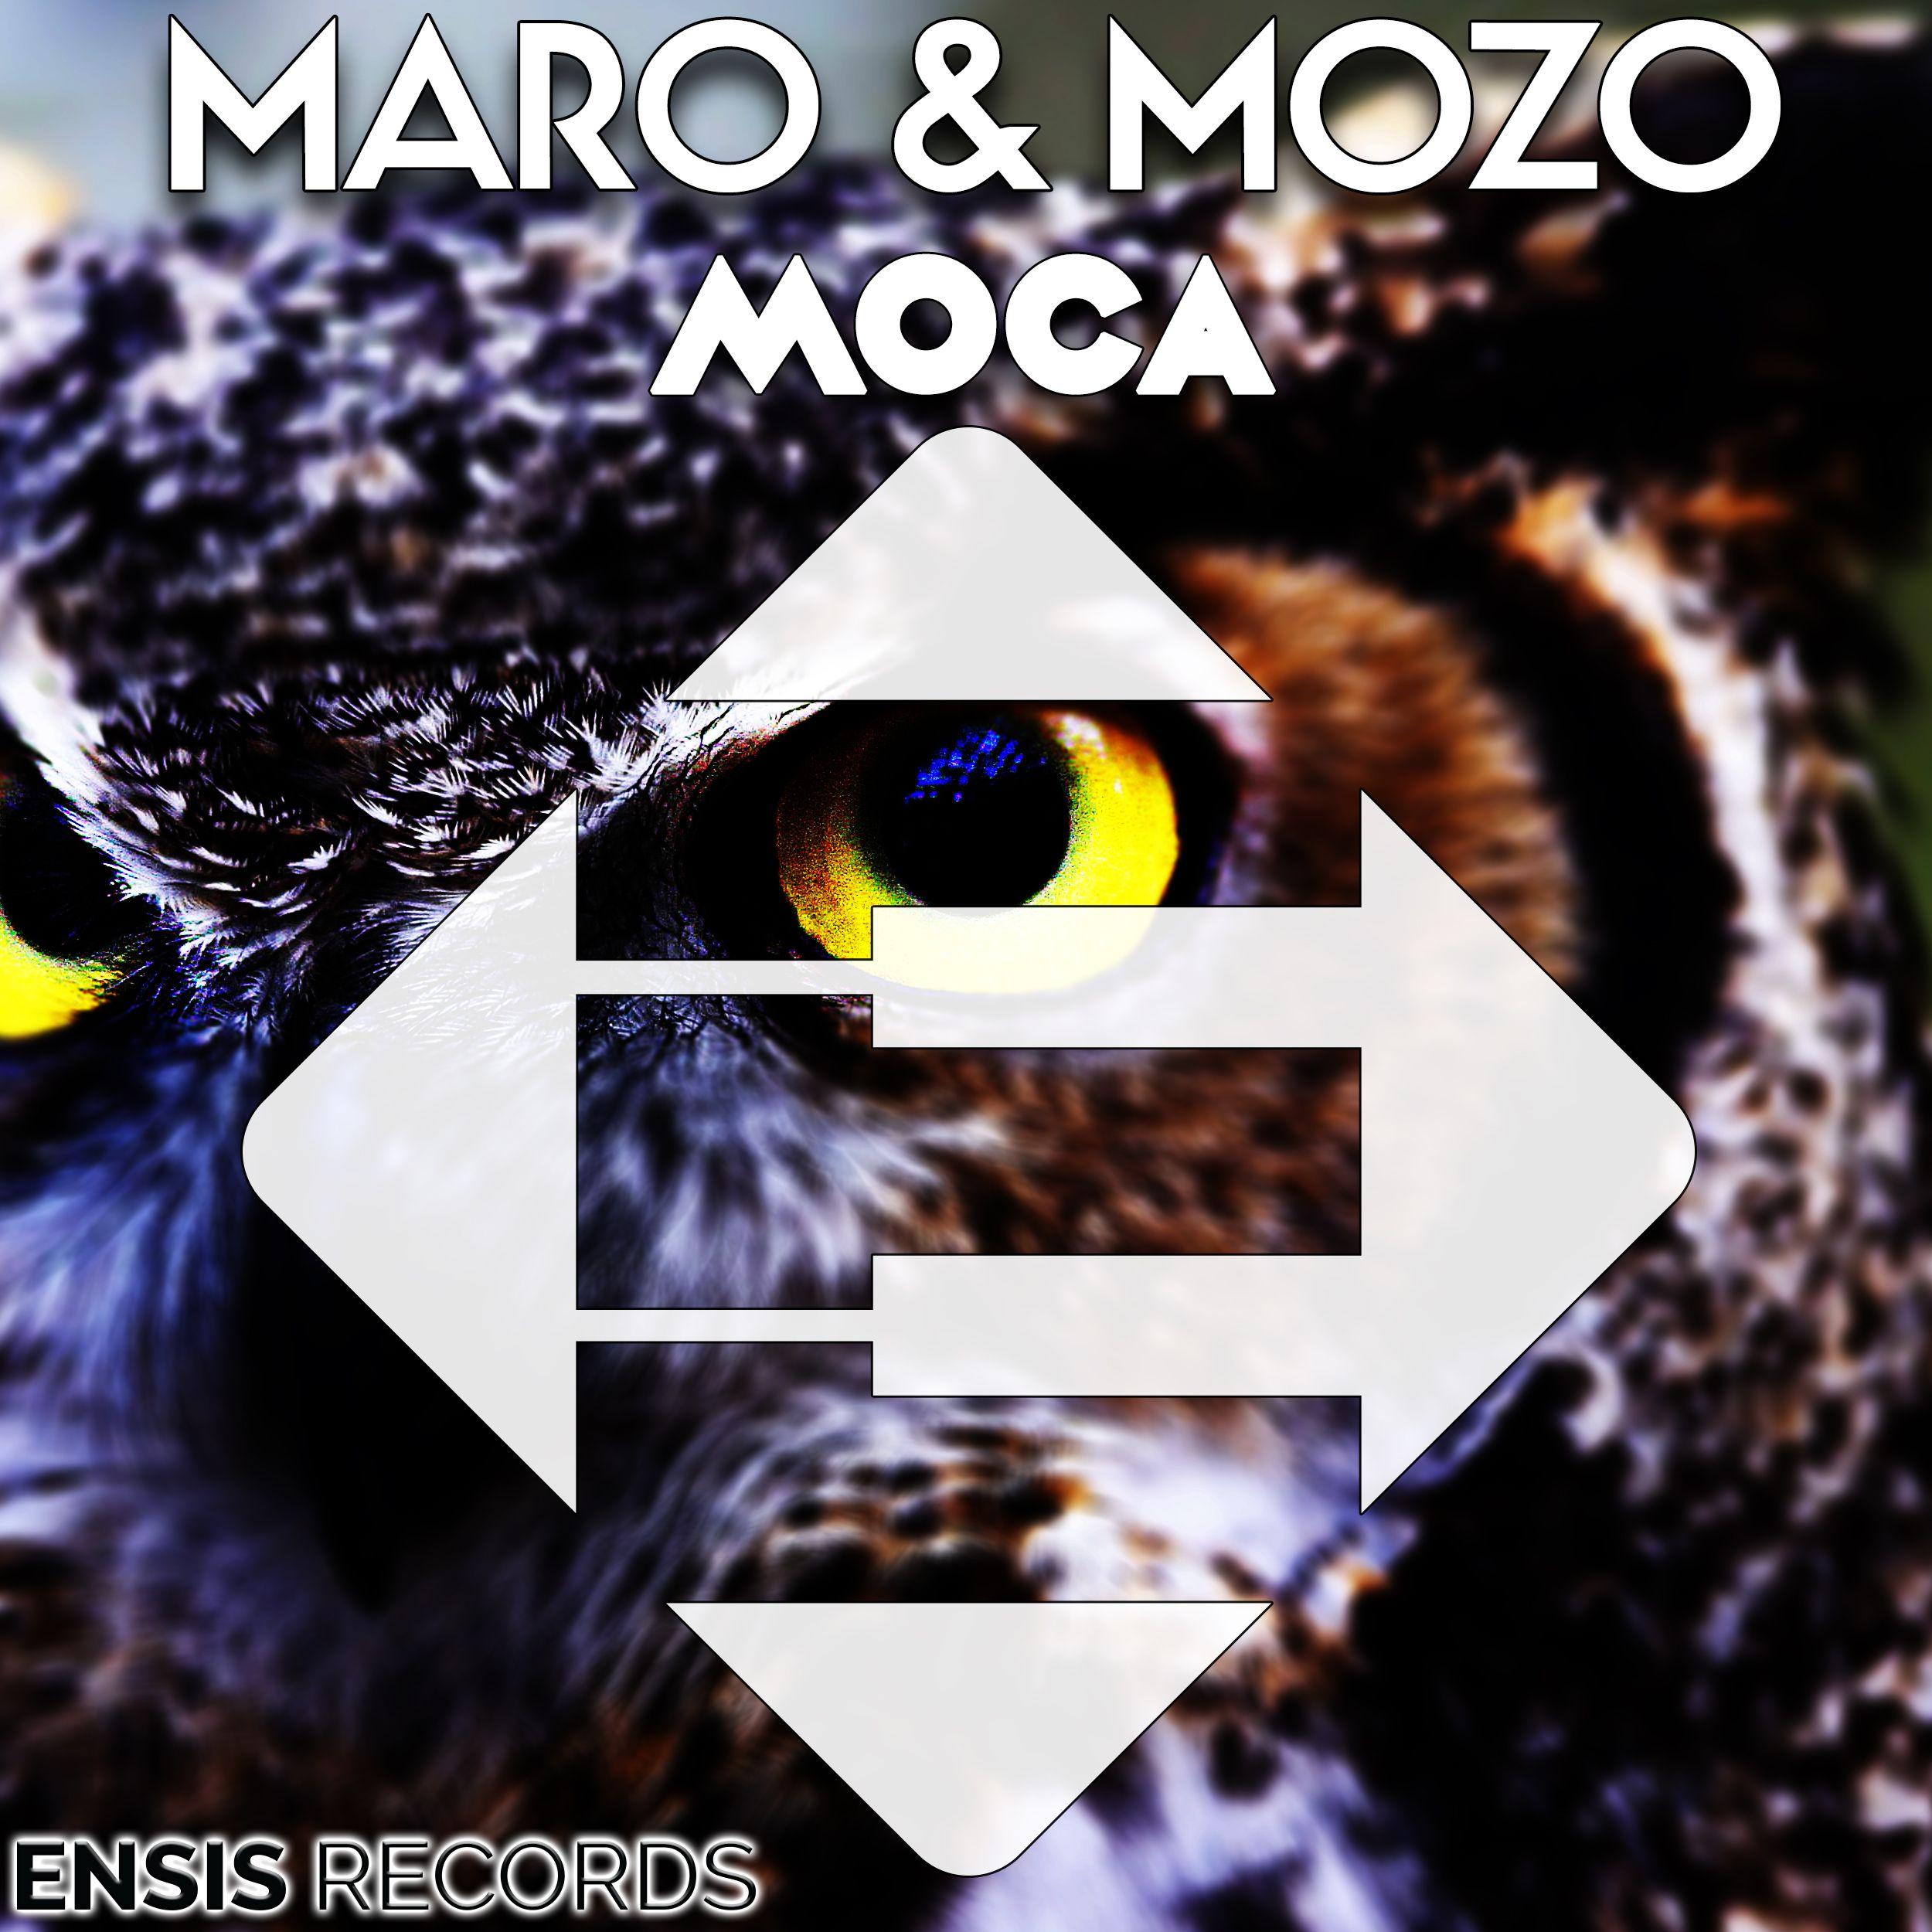 maro_mozo_-_moca.jpg